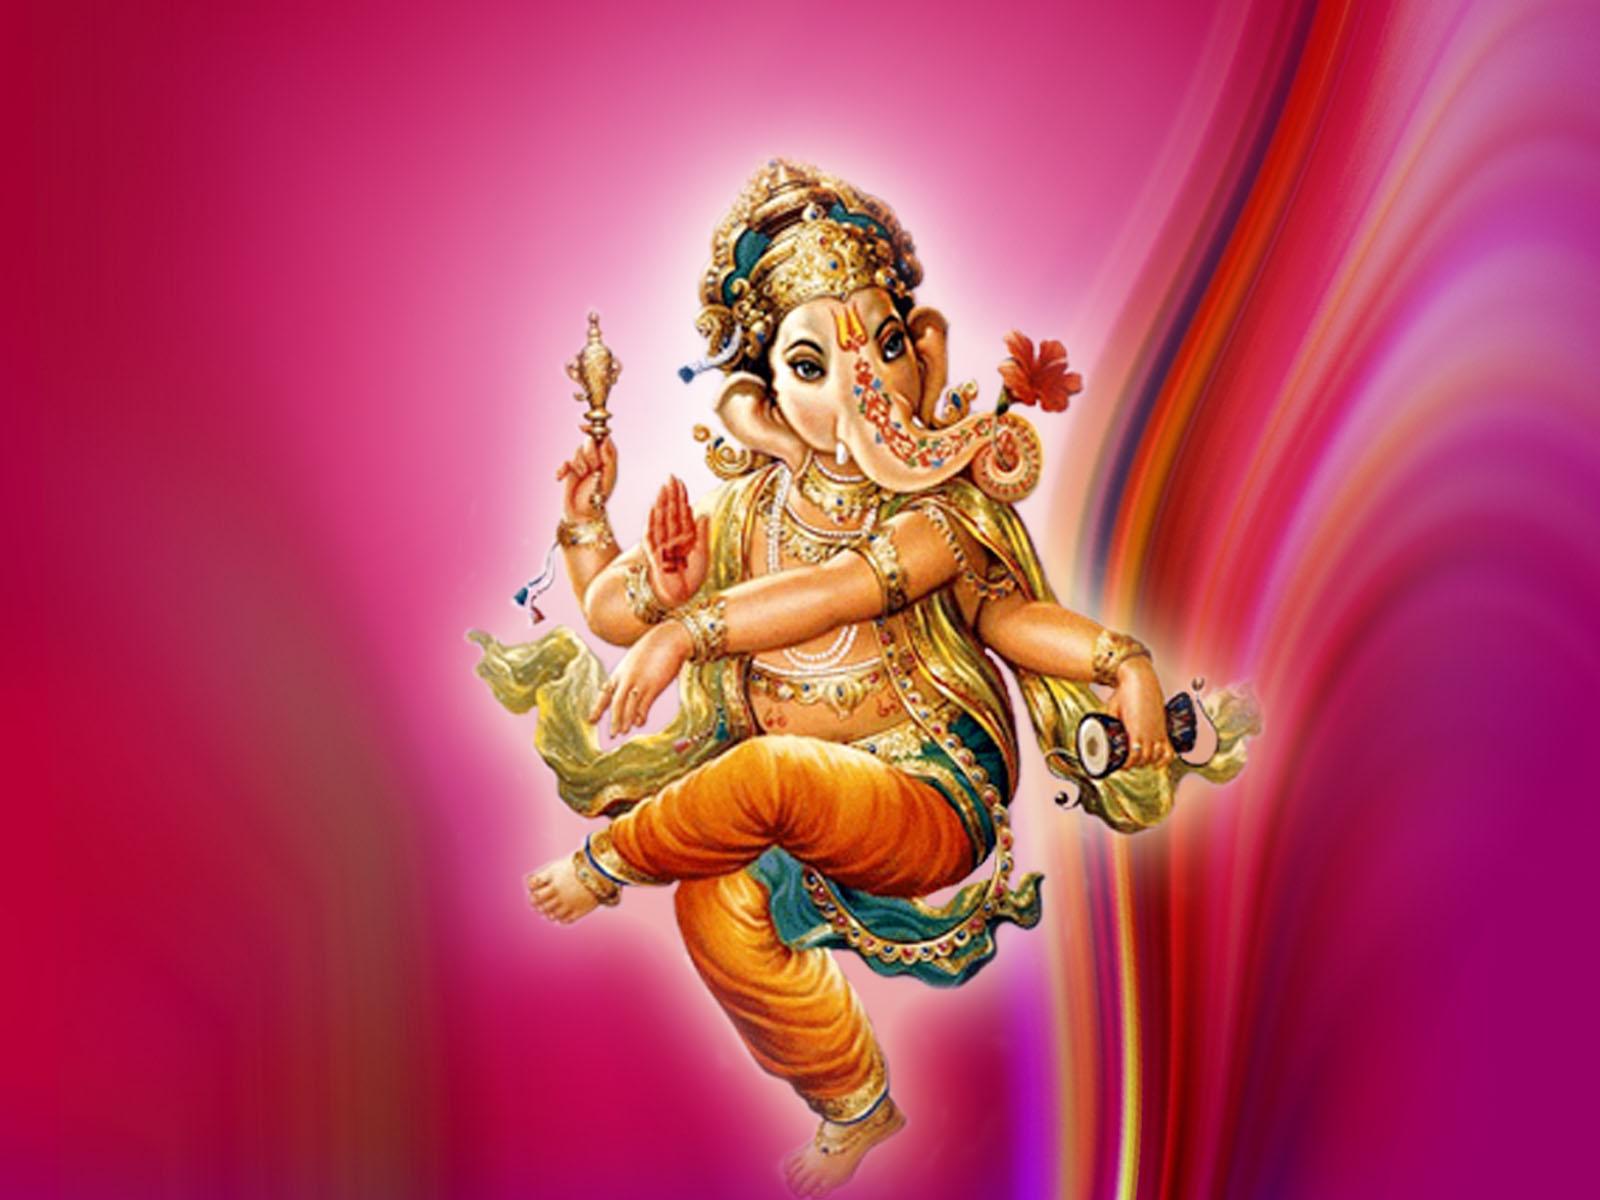 Lord Ganesha Hd Images Free Online: Lord Ganesha Photos Images